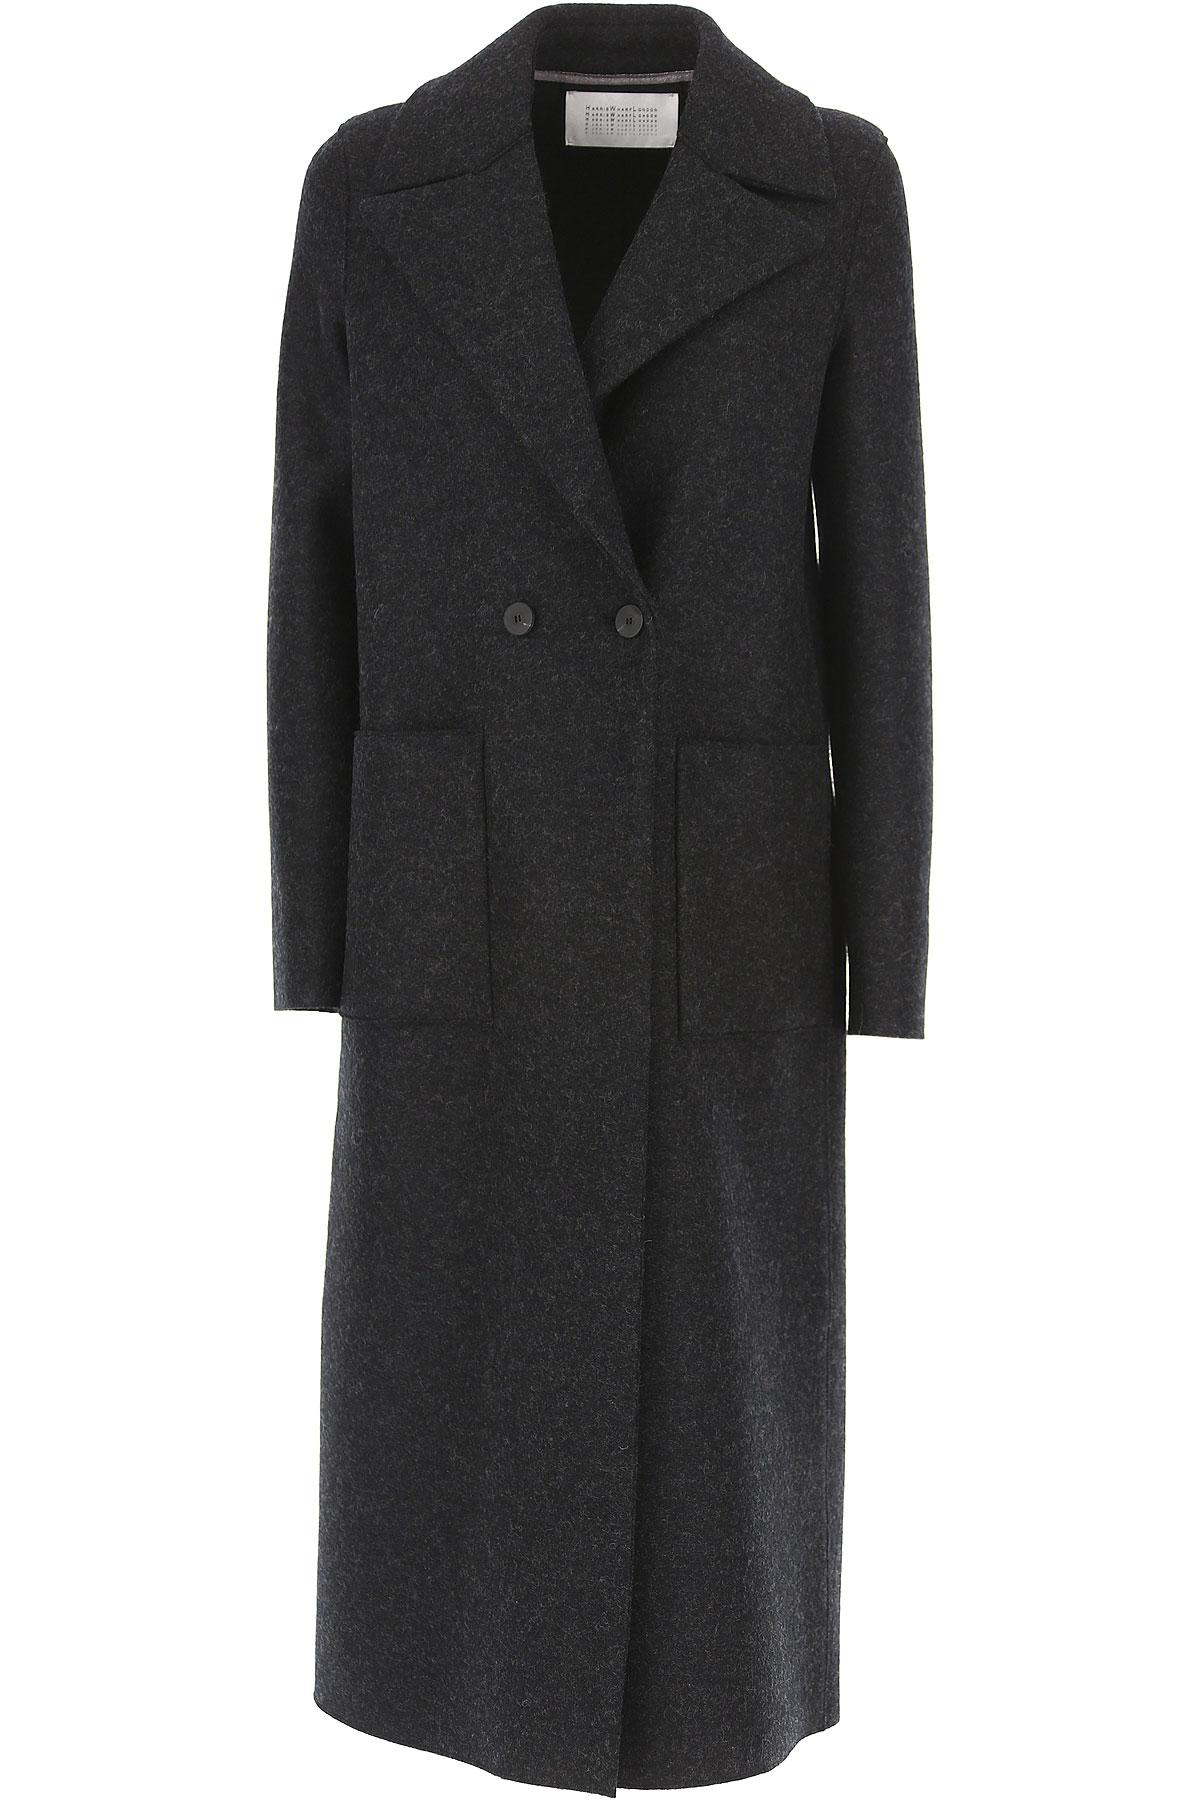 Image of Harris Wharf London Women\'s Coat On Sale, antracite, Virgin wool, 2017, 4 6 8